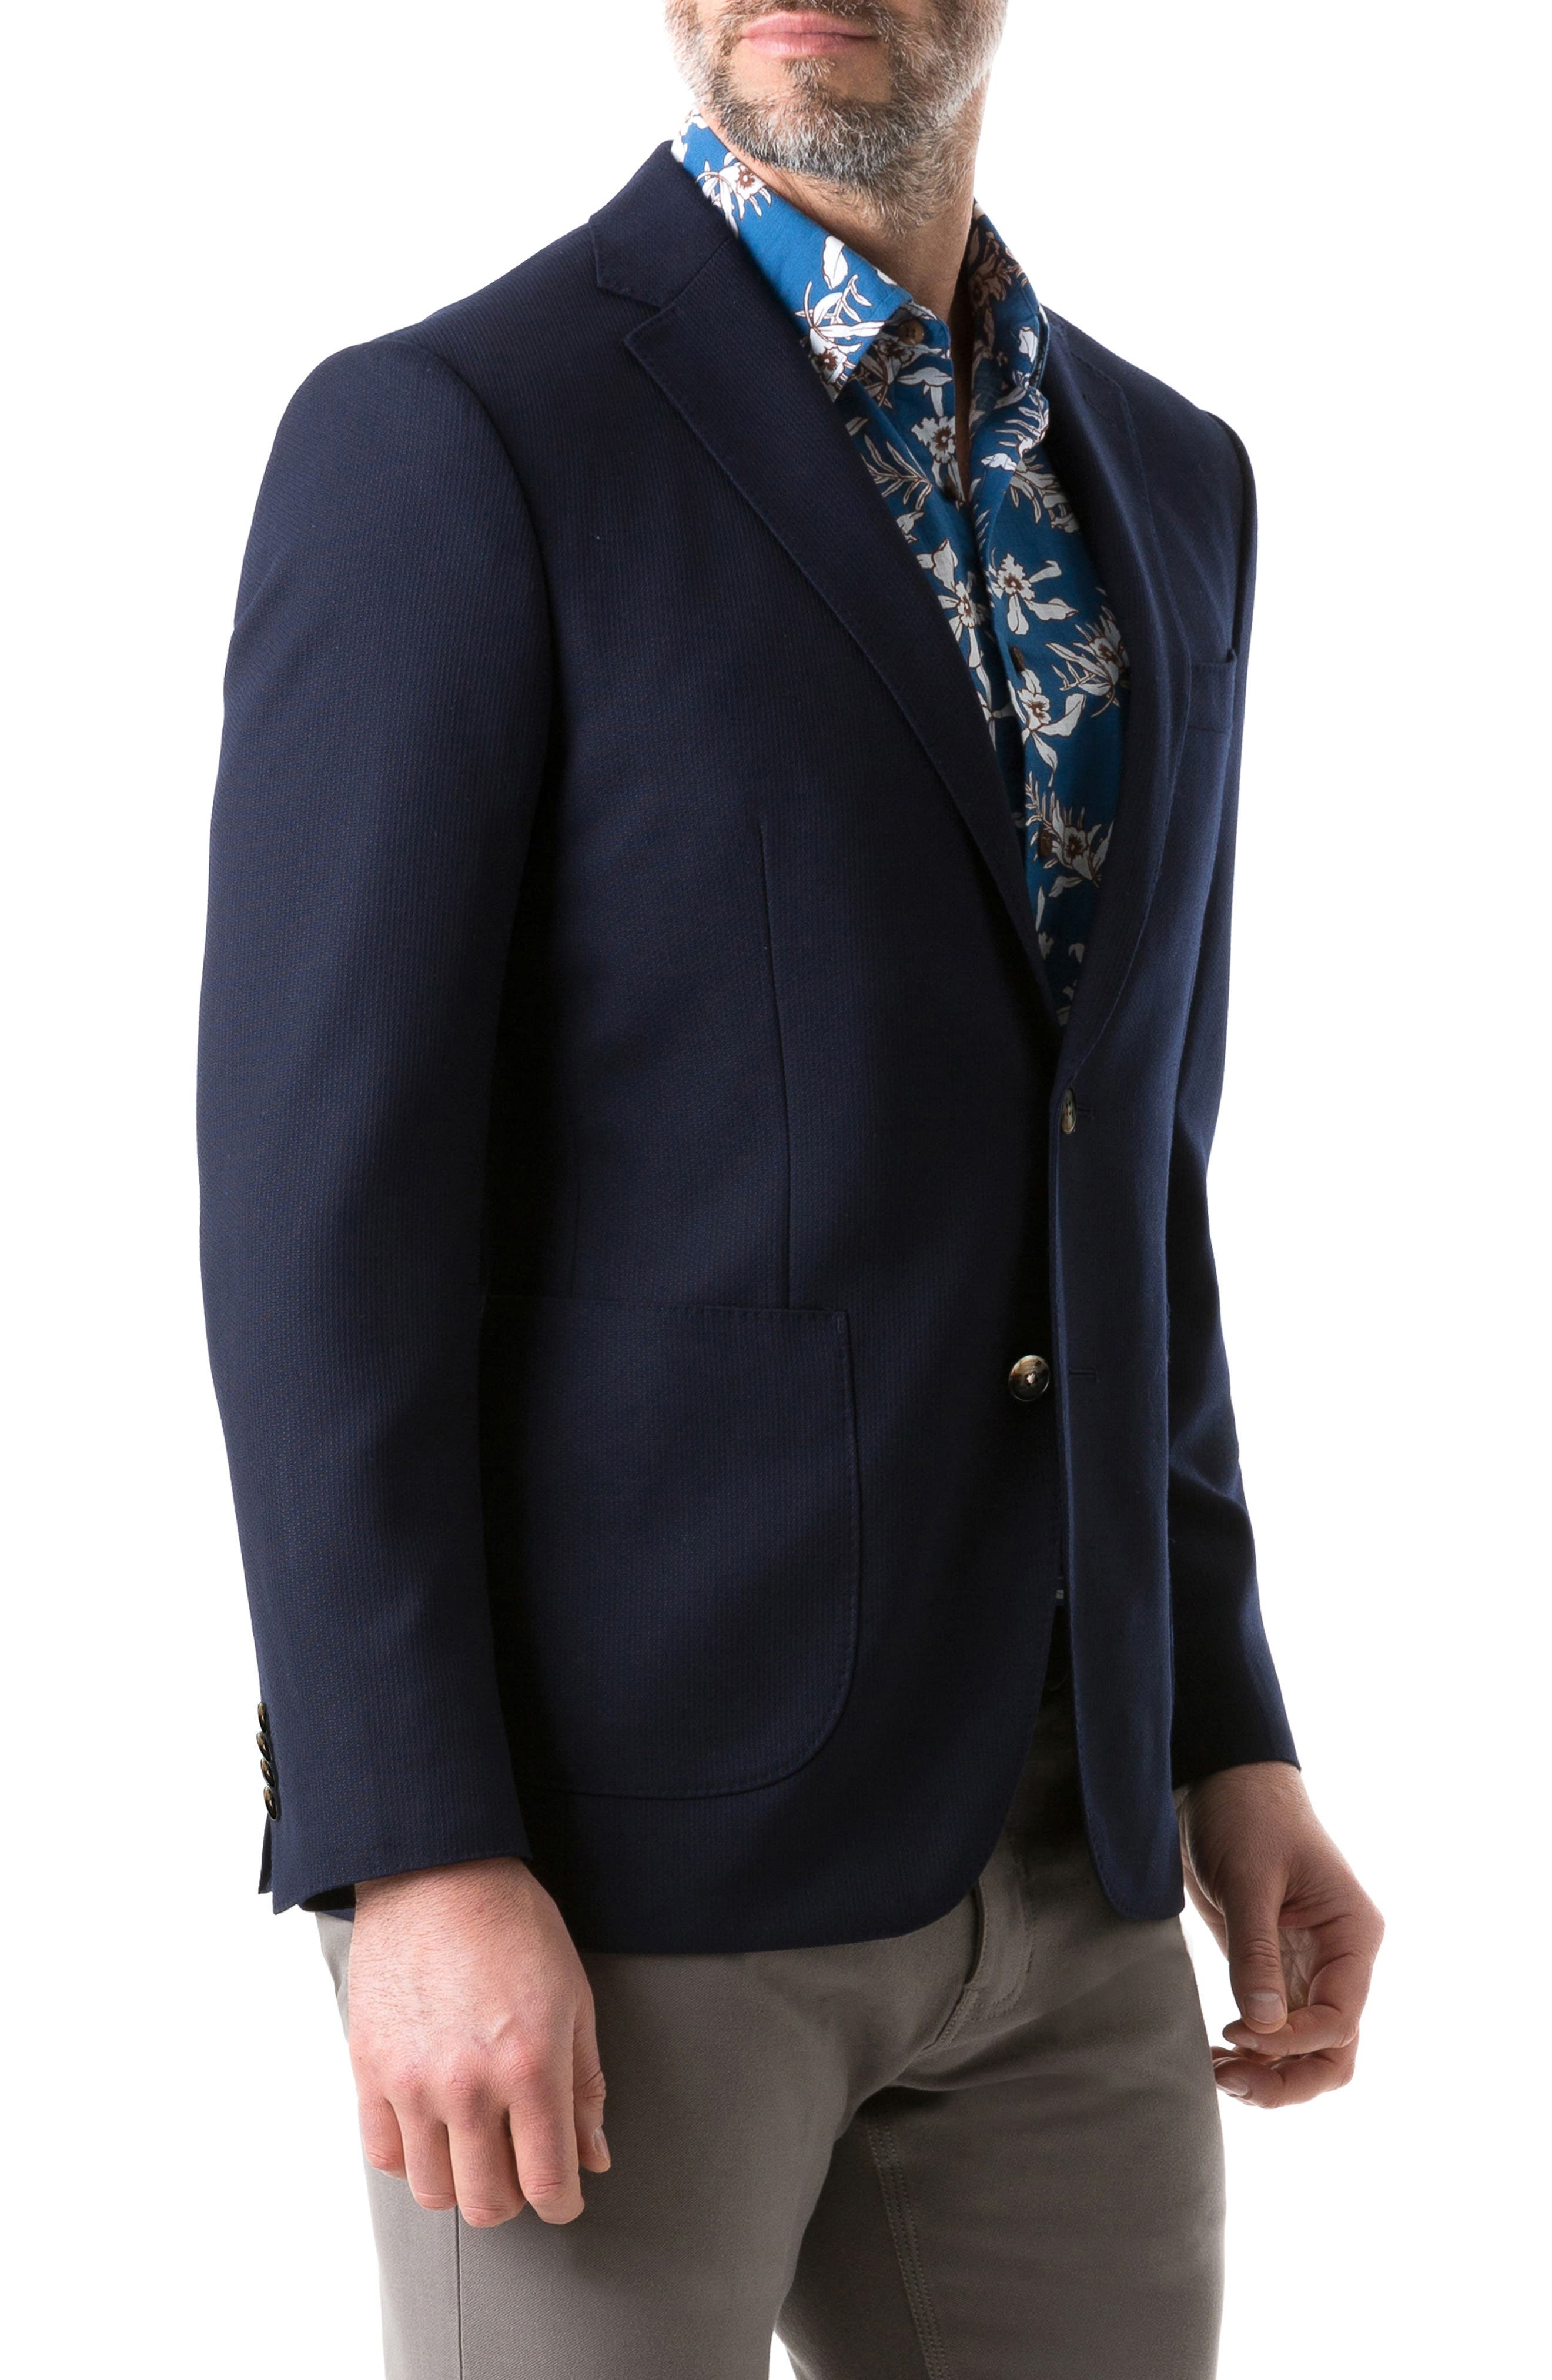 RODD & GUNN, Cotswold Regular Fit Wool Sport Coat, Alternate thumbnail 3, color, 412